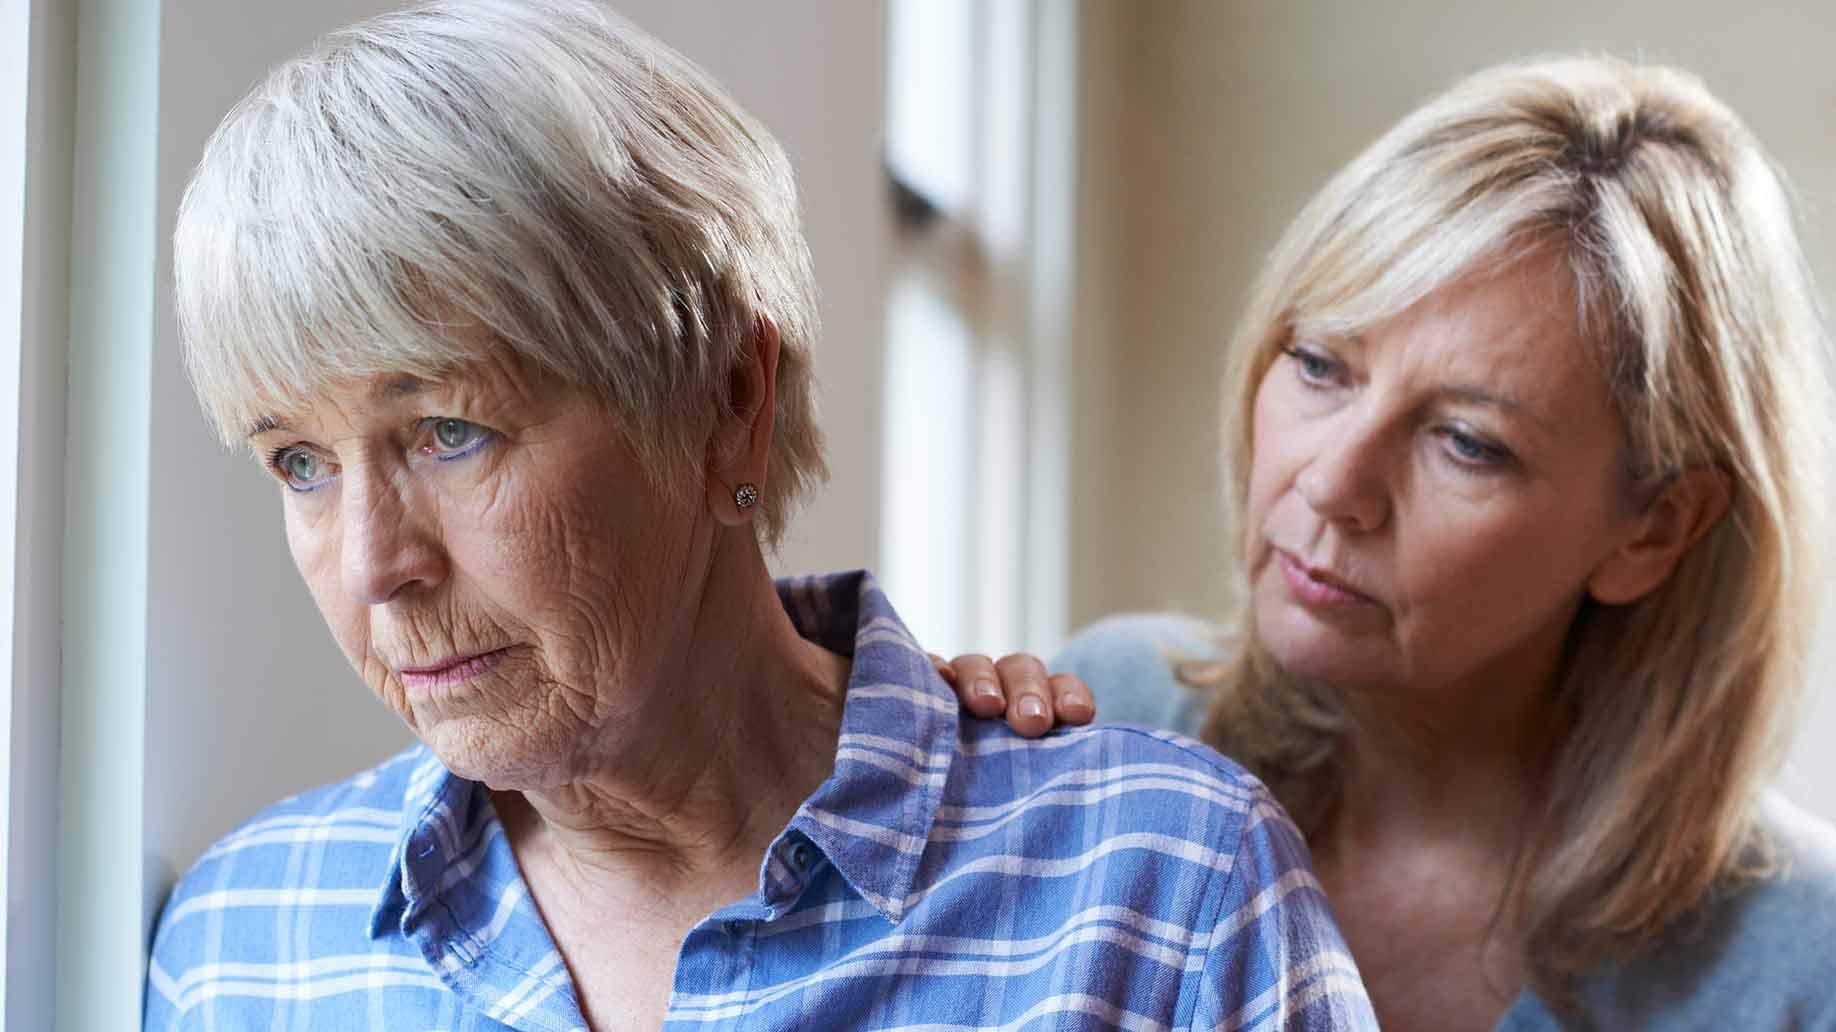 alzheimer's disease dementia vitamin c natural health benefits